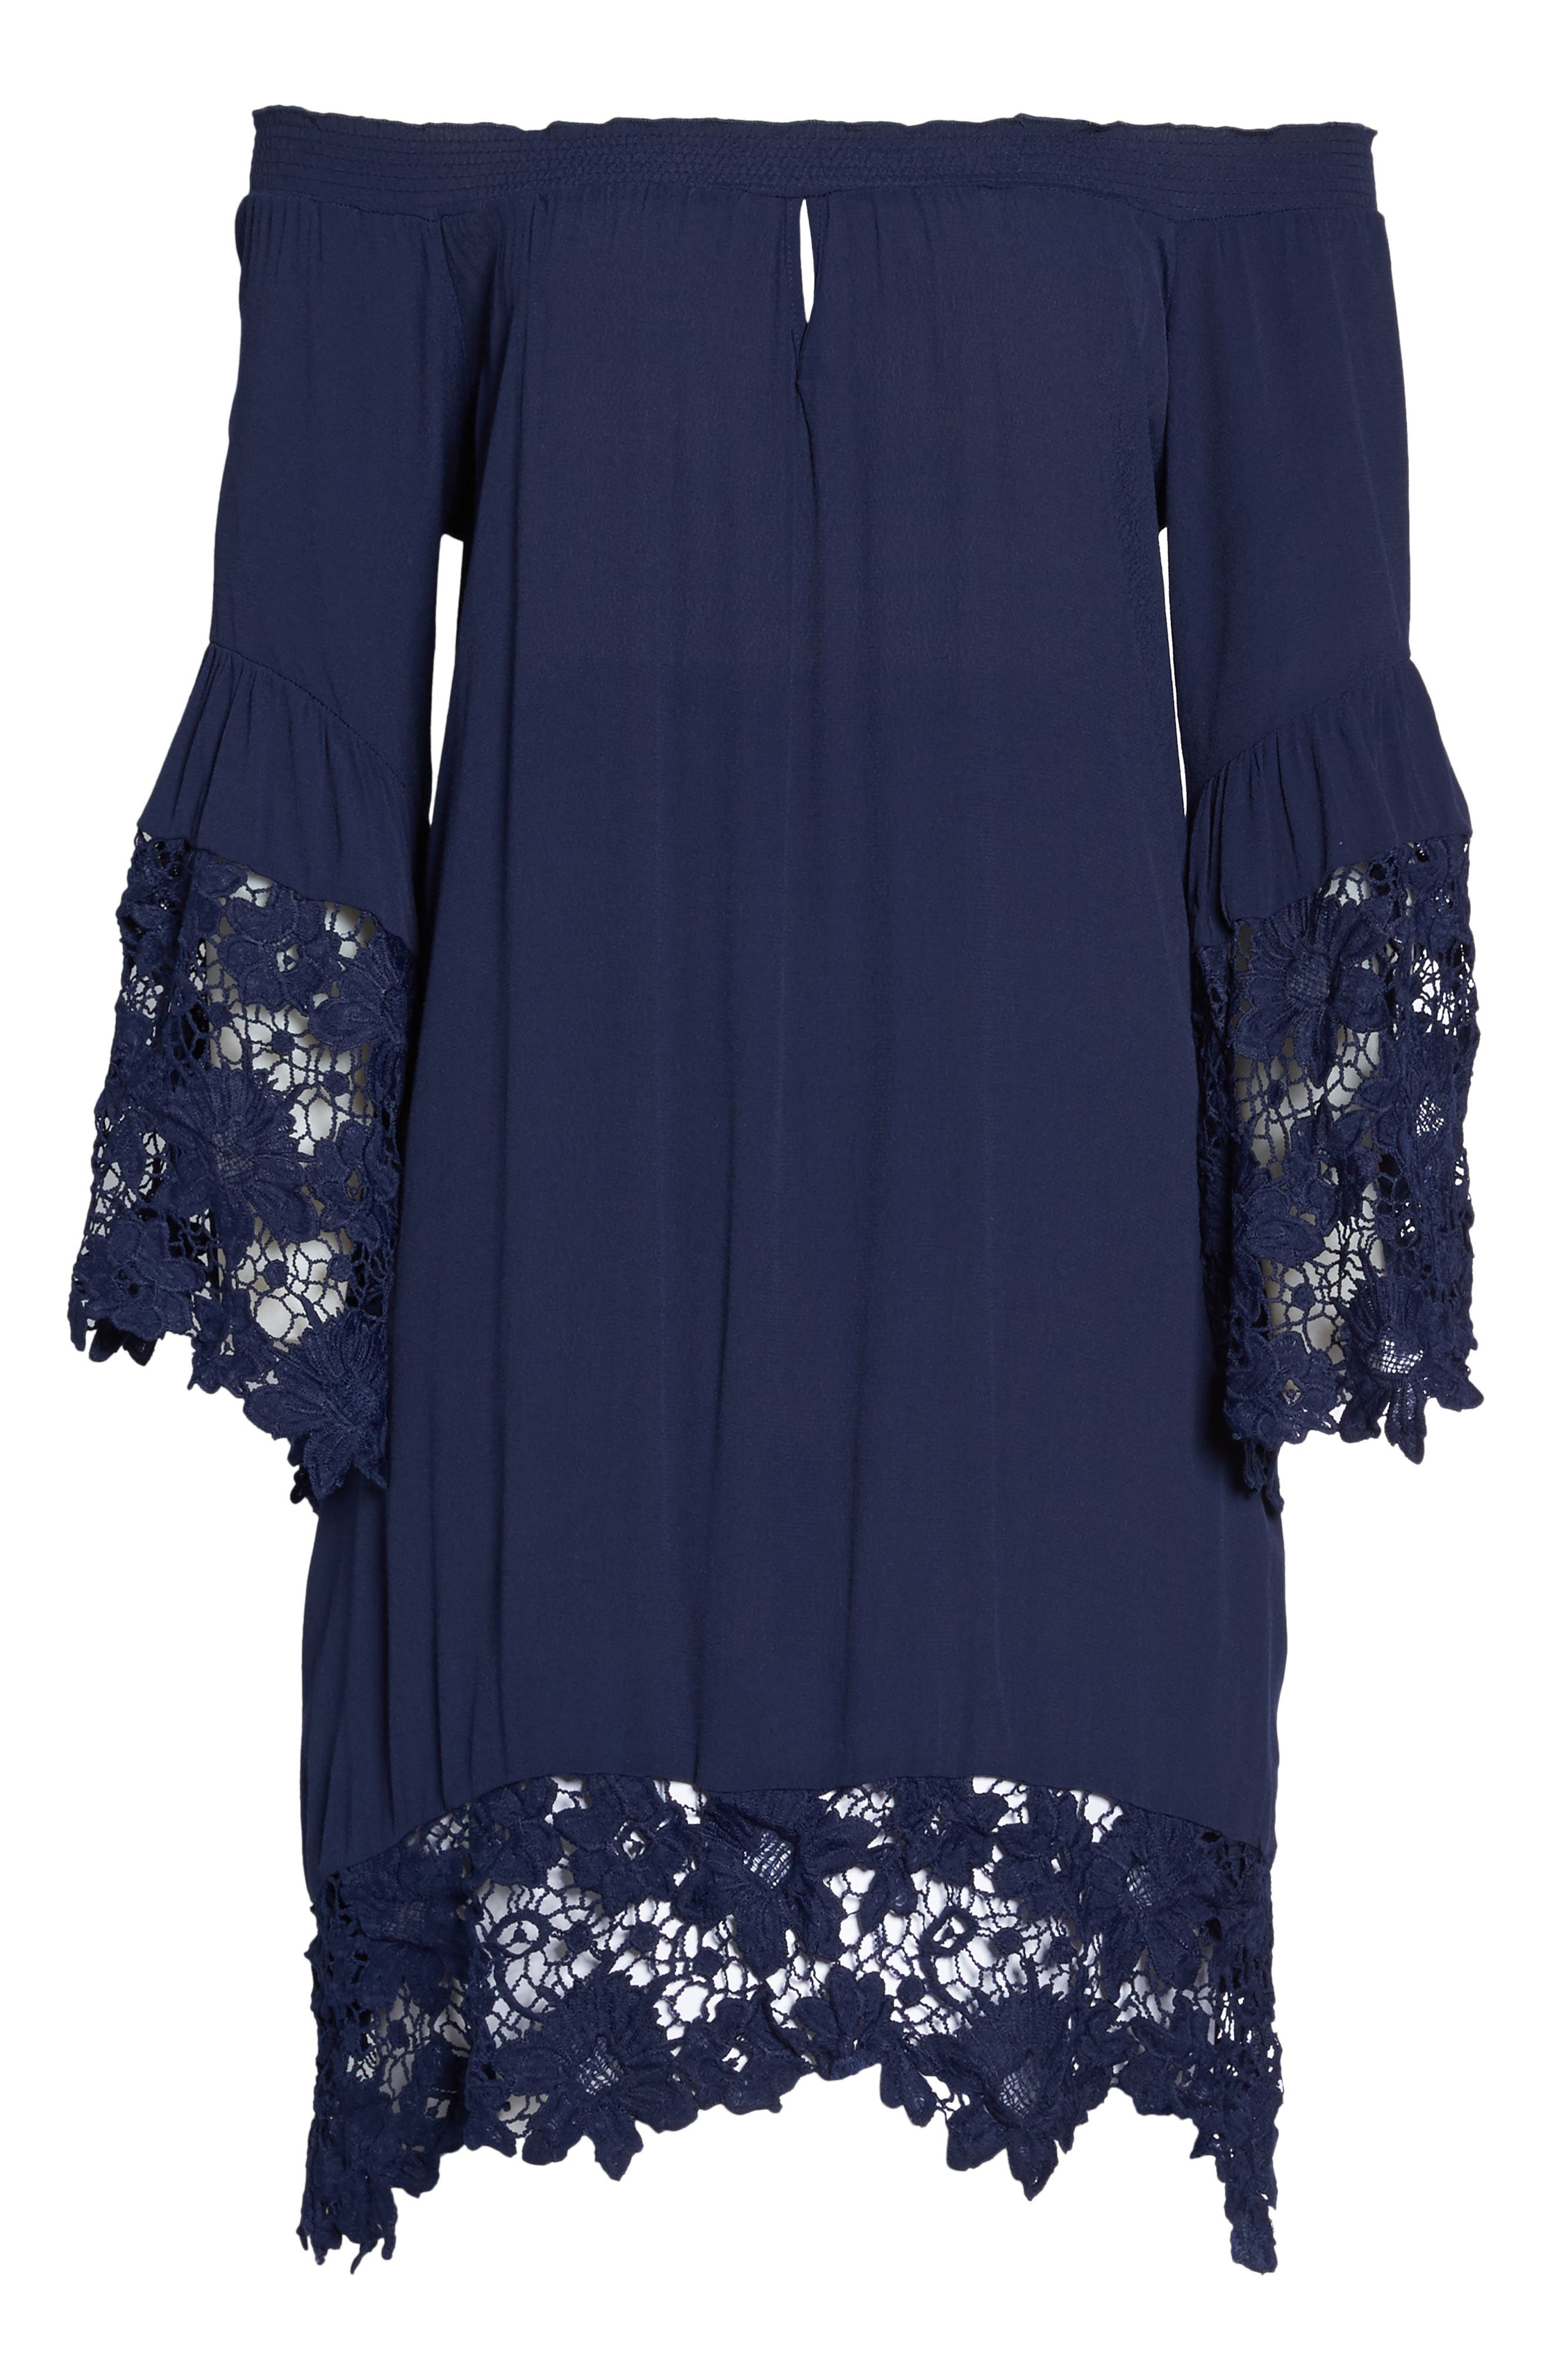 Jolie Lace Accent Cover-Up Dress,                             Alternate thumbnail 6, color,                             Navy